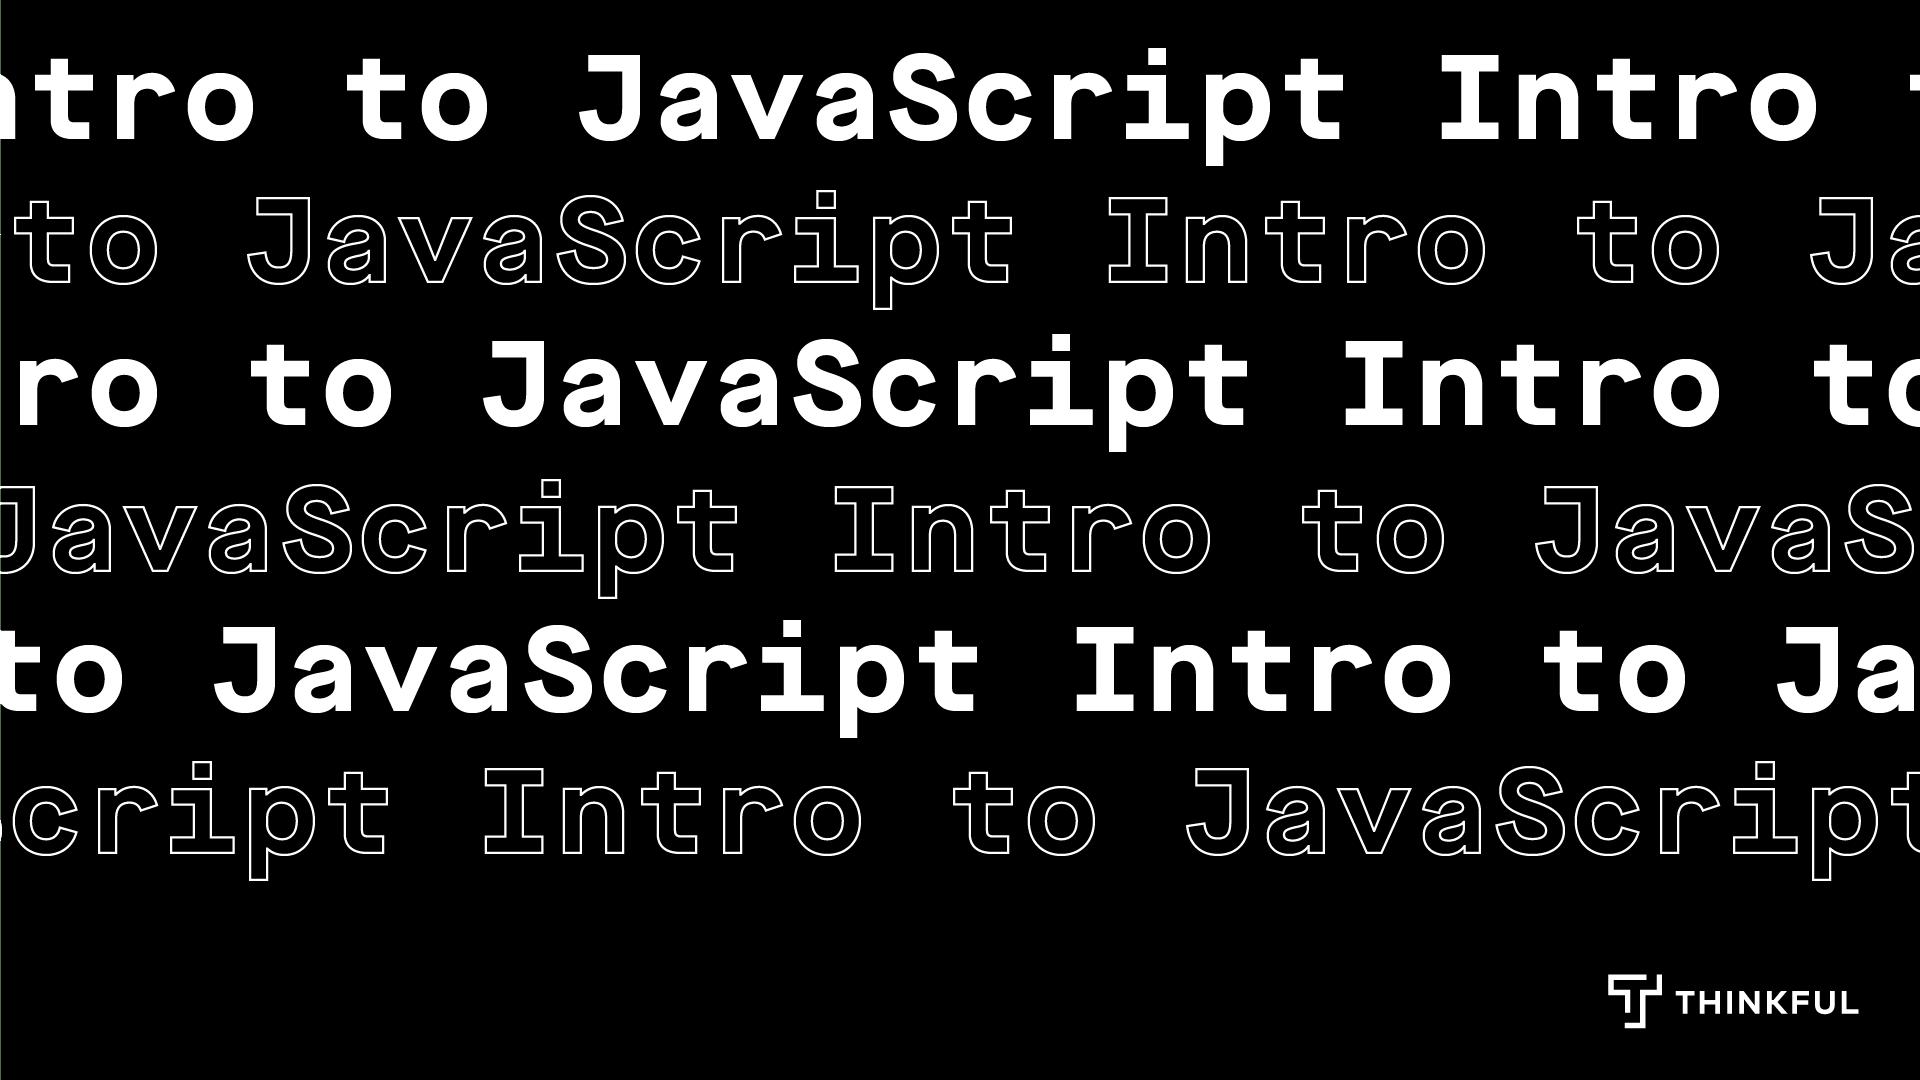 Thinkful Webinar: Intro to JavaScript: Build a Virtual Pet